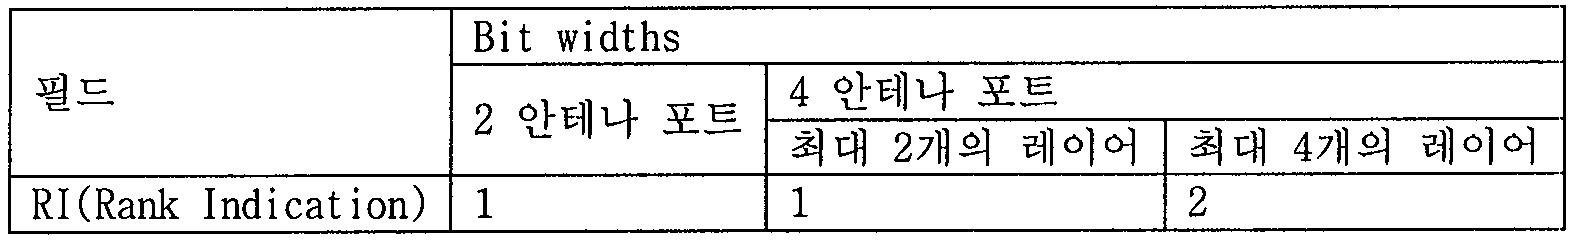 Figure 112011500627815-pat00222